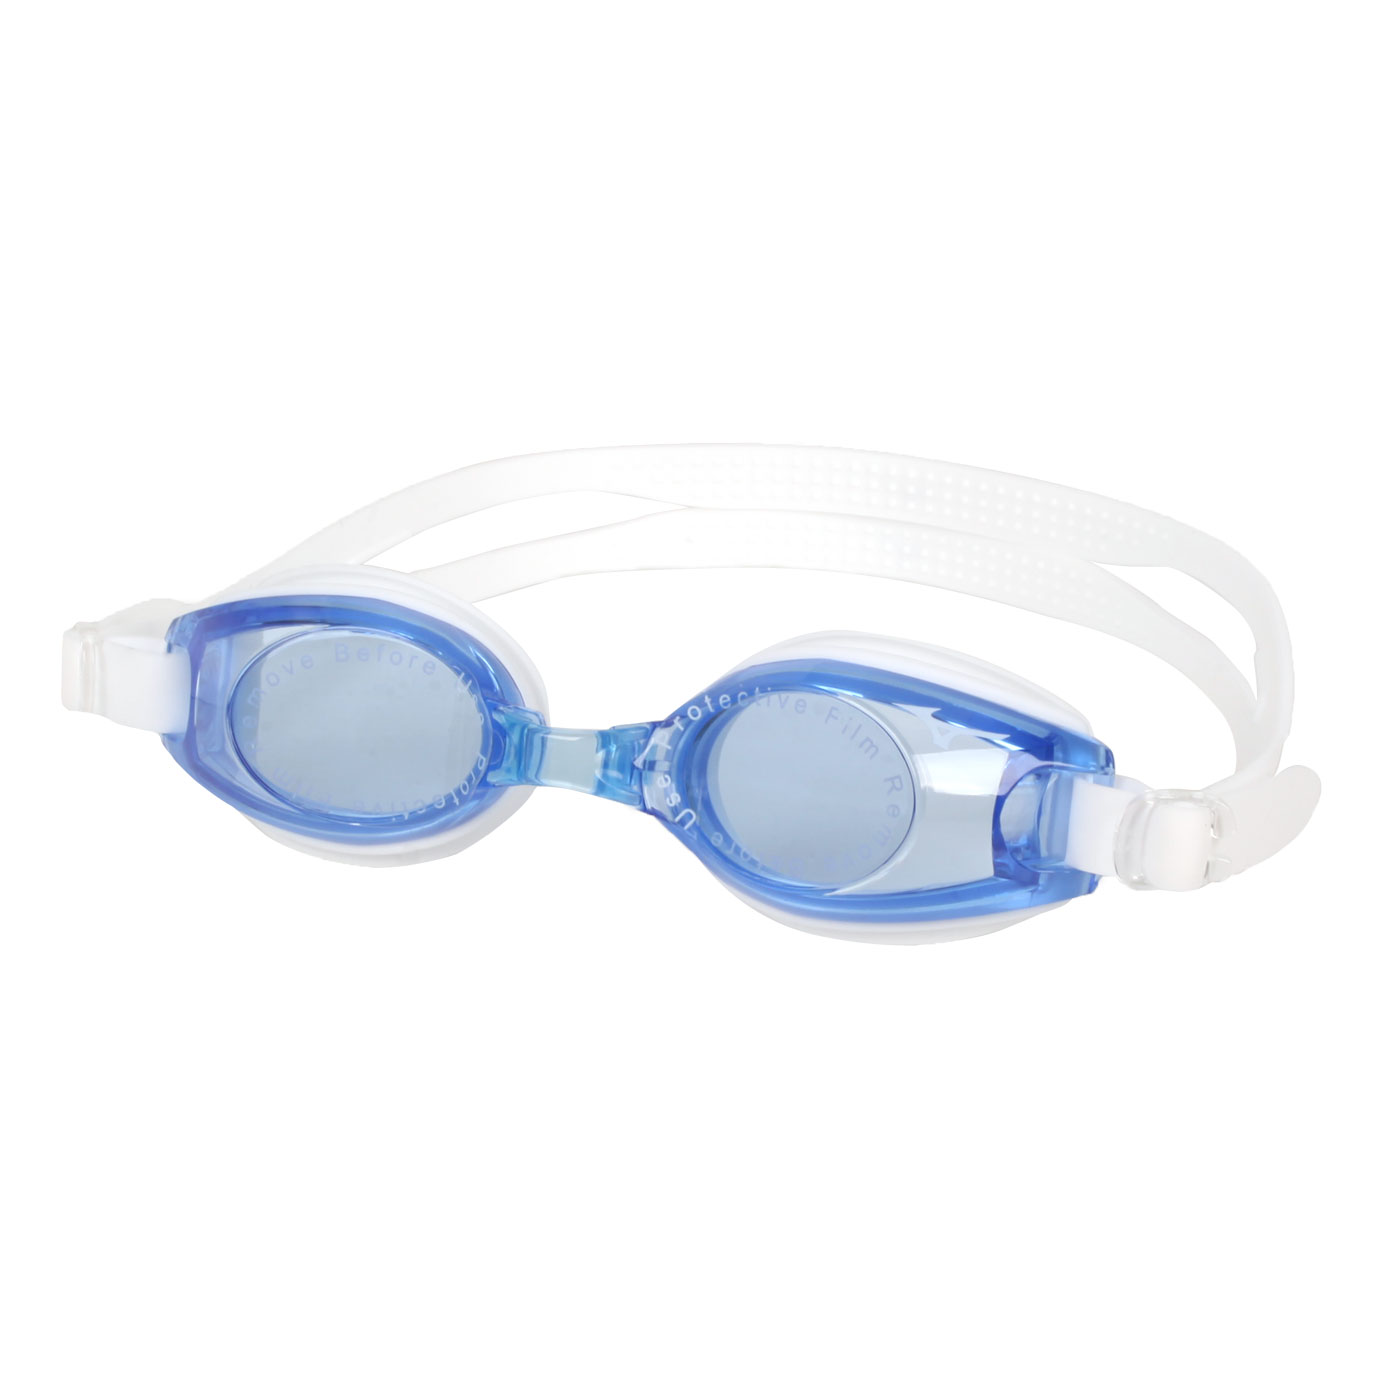 MIZUNO 兒童泳鏡  SWIMN3TF059500-09 - 淺藍白